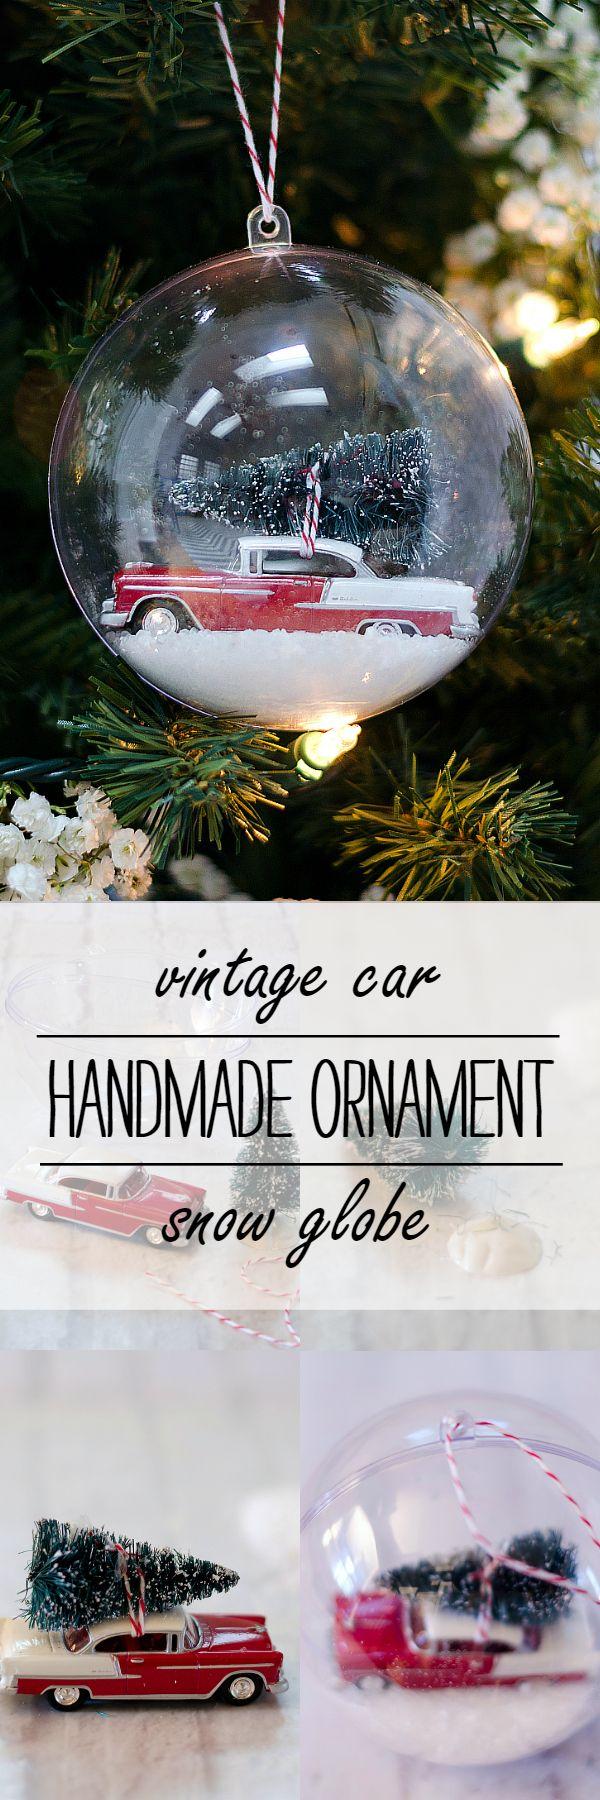 Snow Globe Ornament Christmas ornaments, Christmas